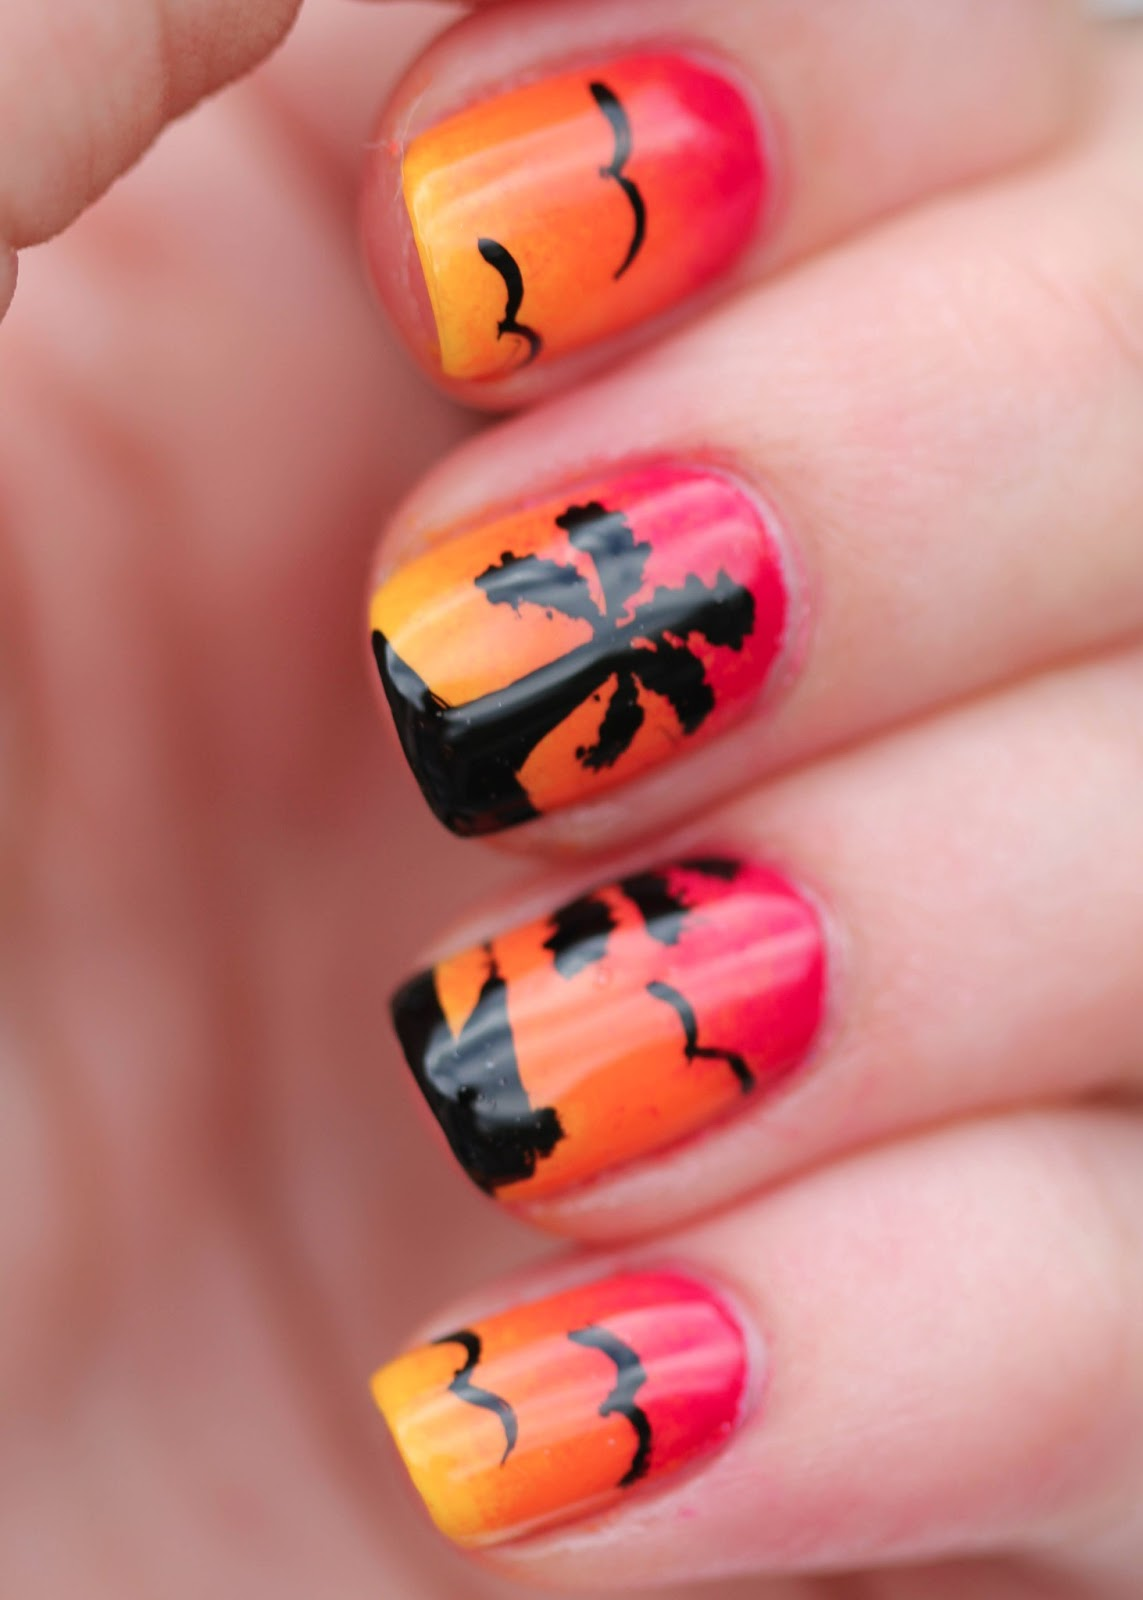 Palm Tree Pop Art Sunset nail art with palm